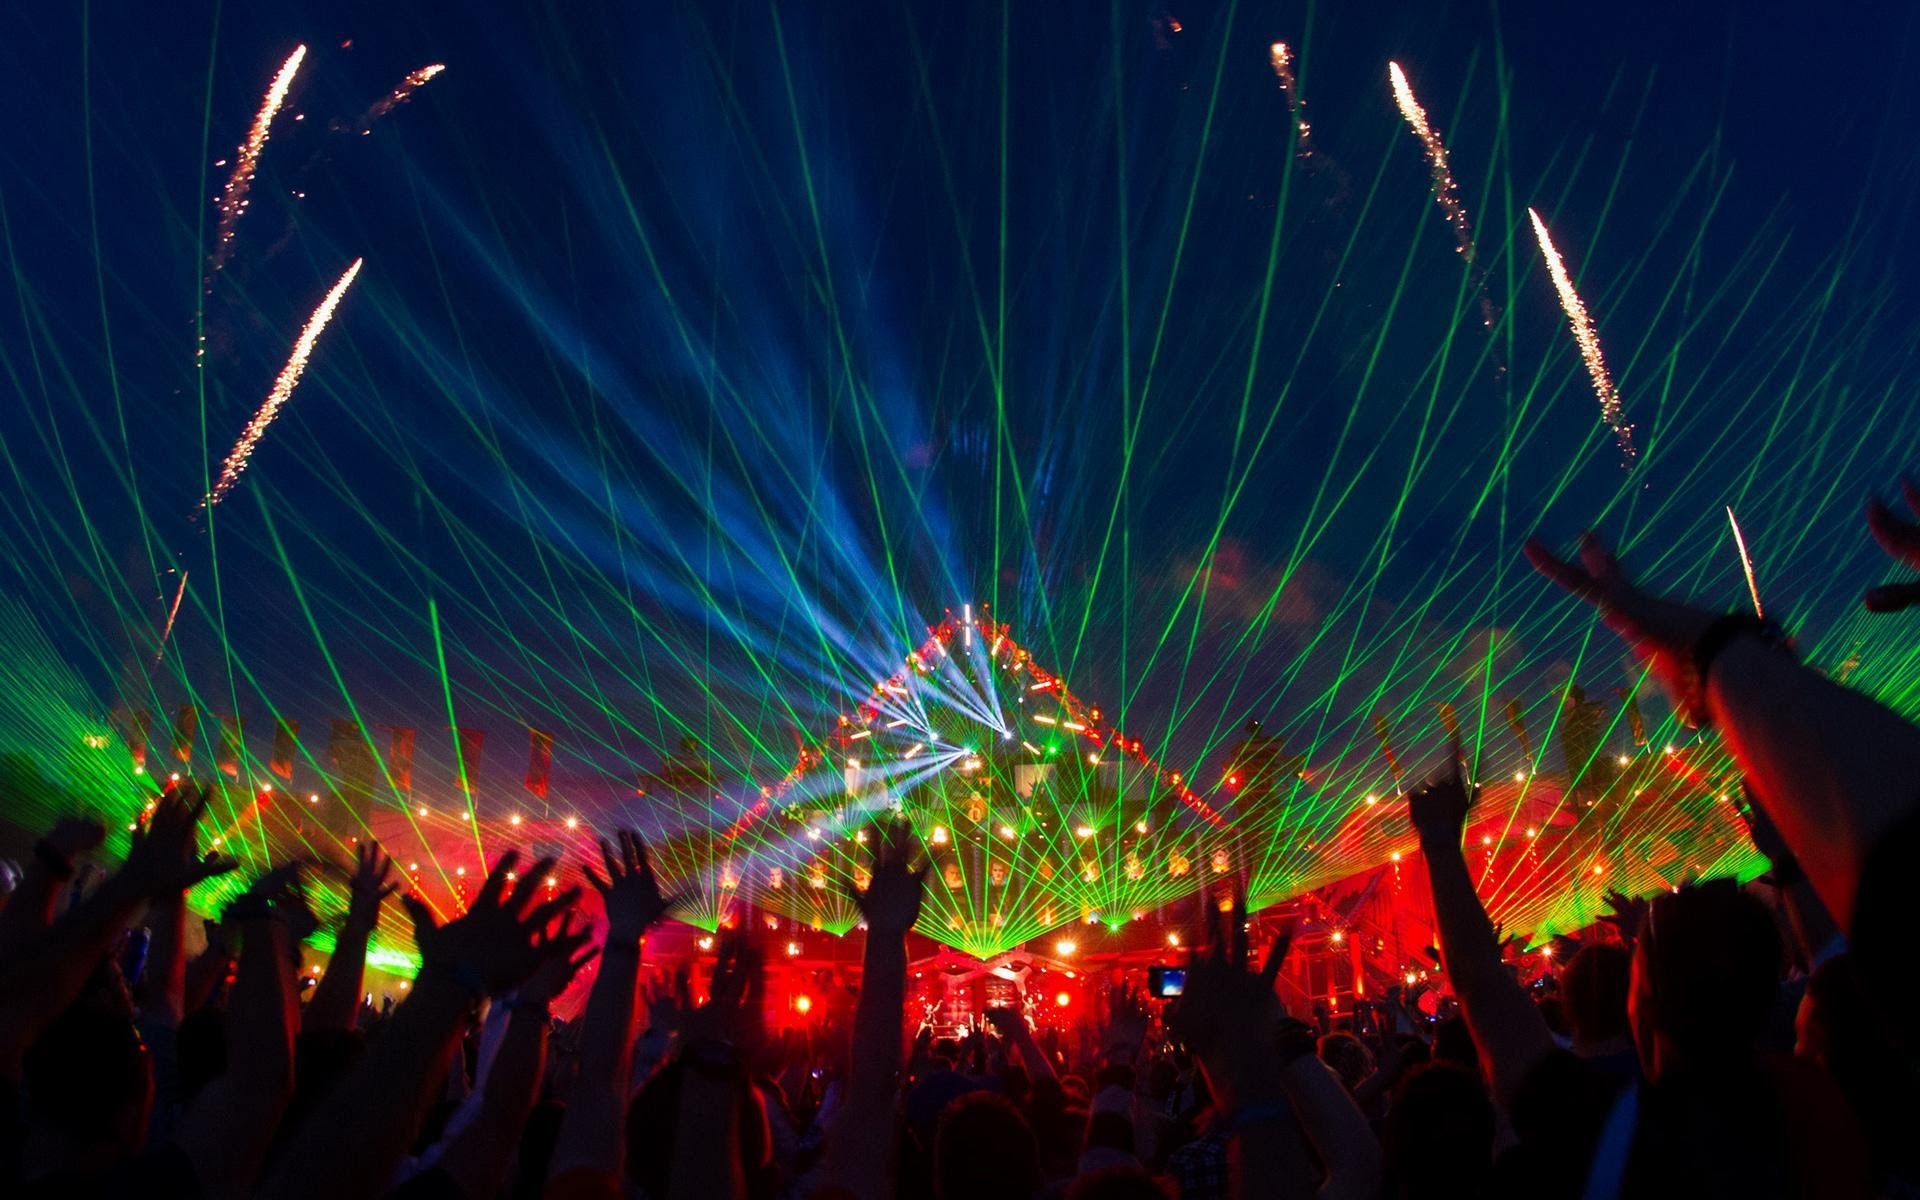 Concert Crowd Wallpaper (65+ images)